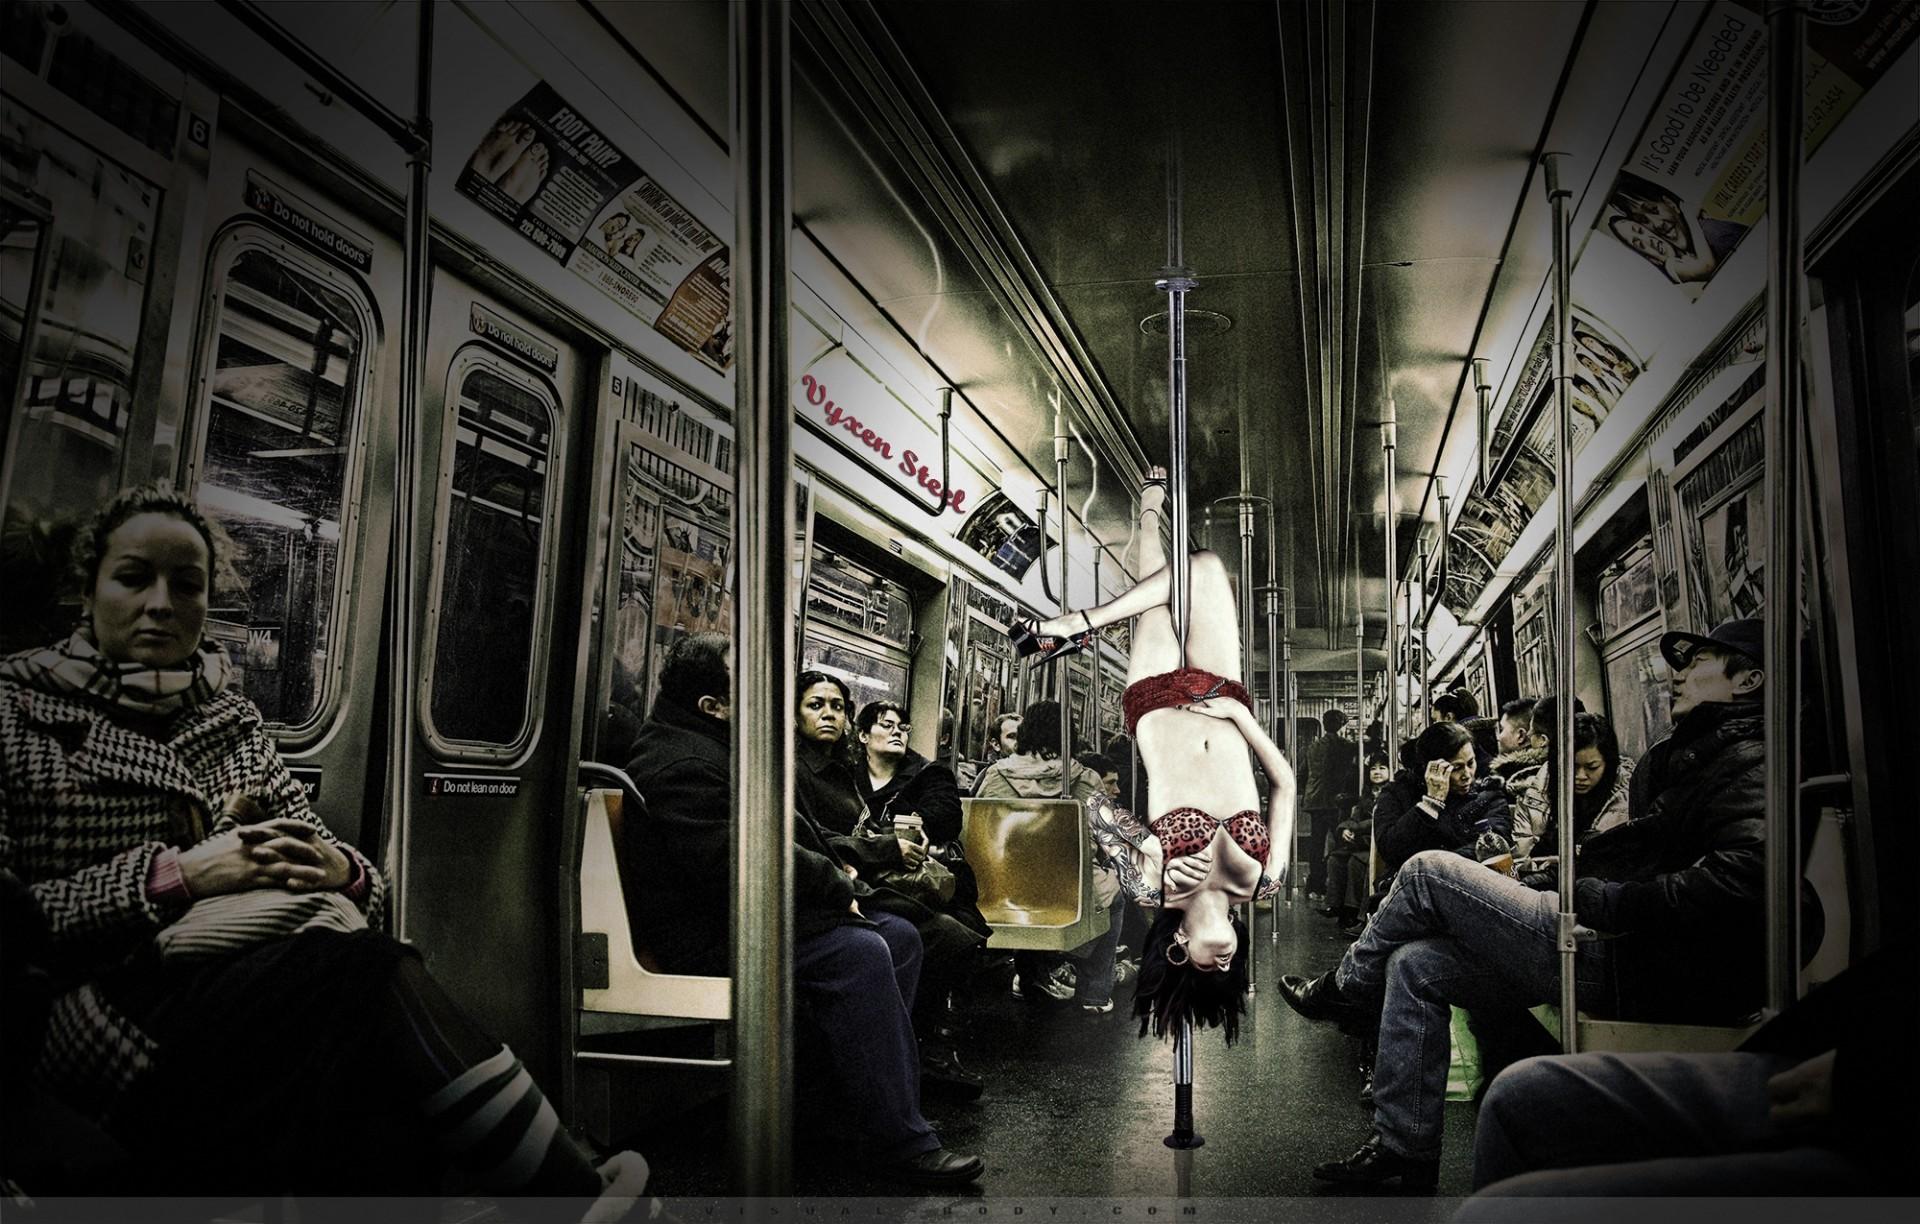 Urban Life II - Danseuse dans le métro